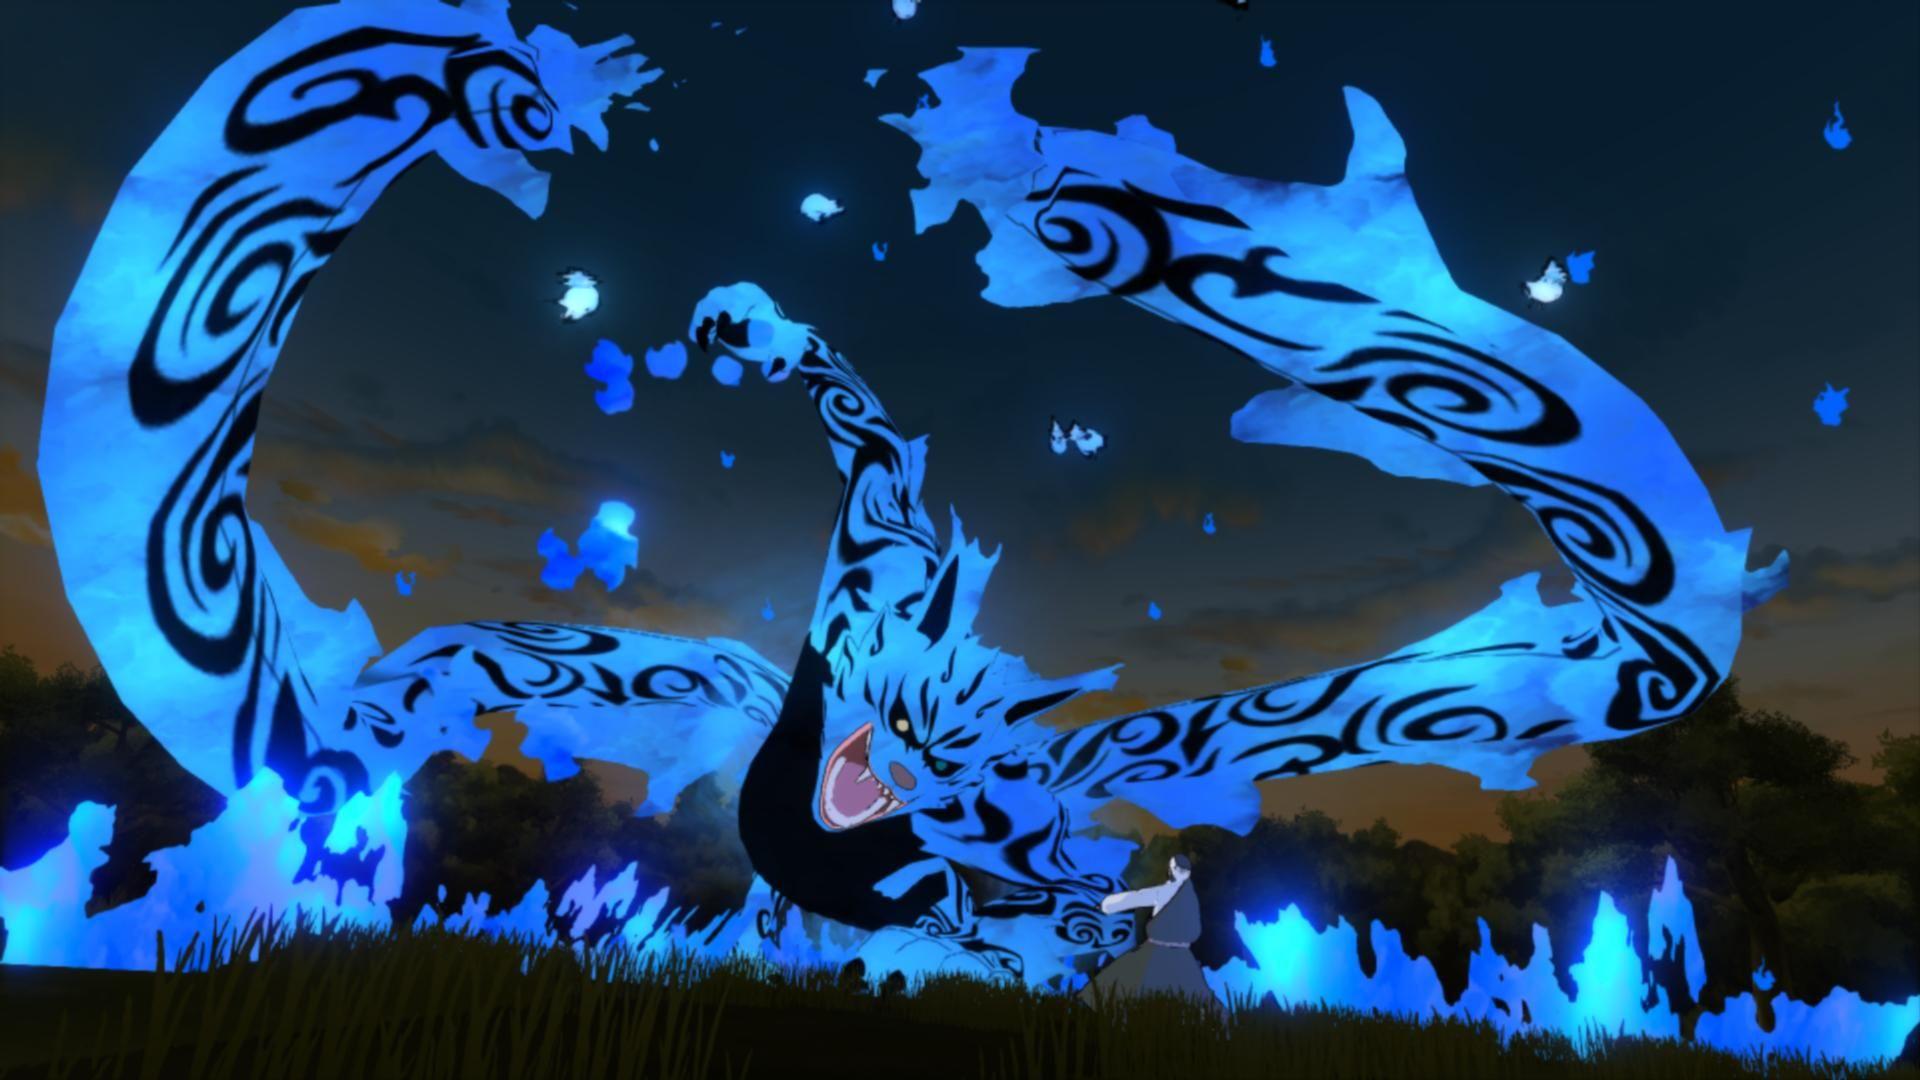 Good Wallpaper Naruto Blue - 4ffc44edc3c42726bb1343dbc07bf4bf  Picture_316450.jpg